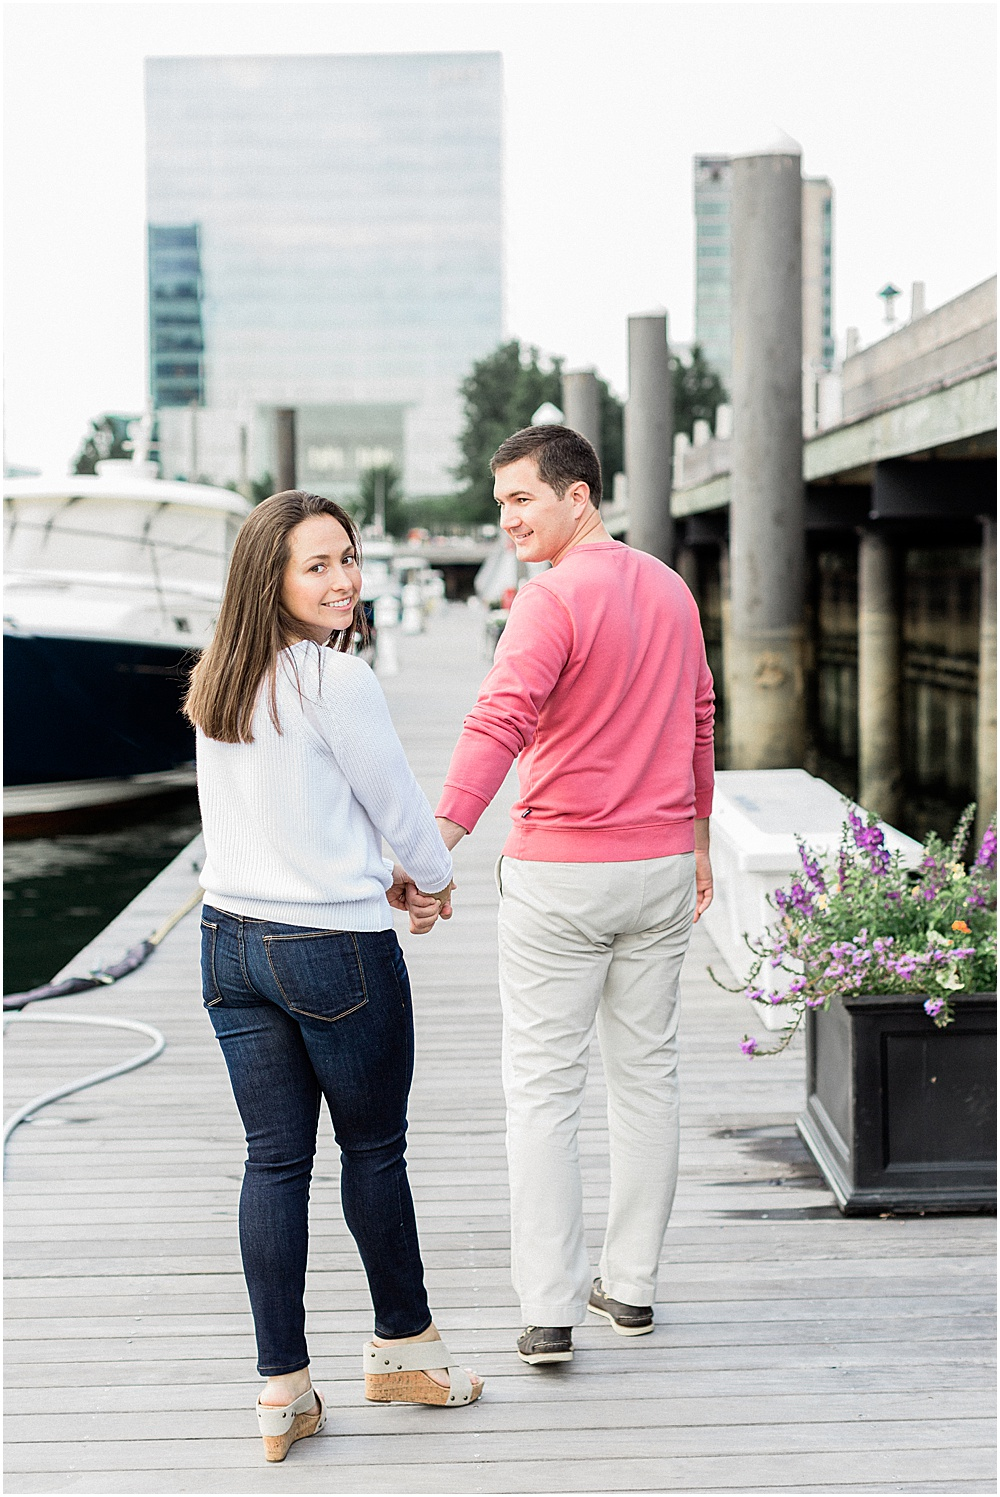 ica_kelsey_Zach_york_maine_boston_seaport_enagement_session_cape_cod_massachusetts_boston_wedding_photographer_meredith_jane_photography_photo_0622.jpg